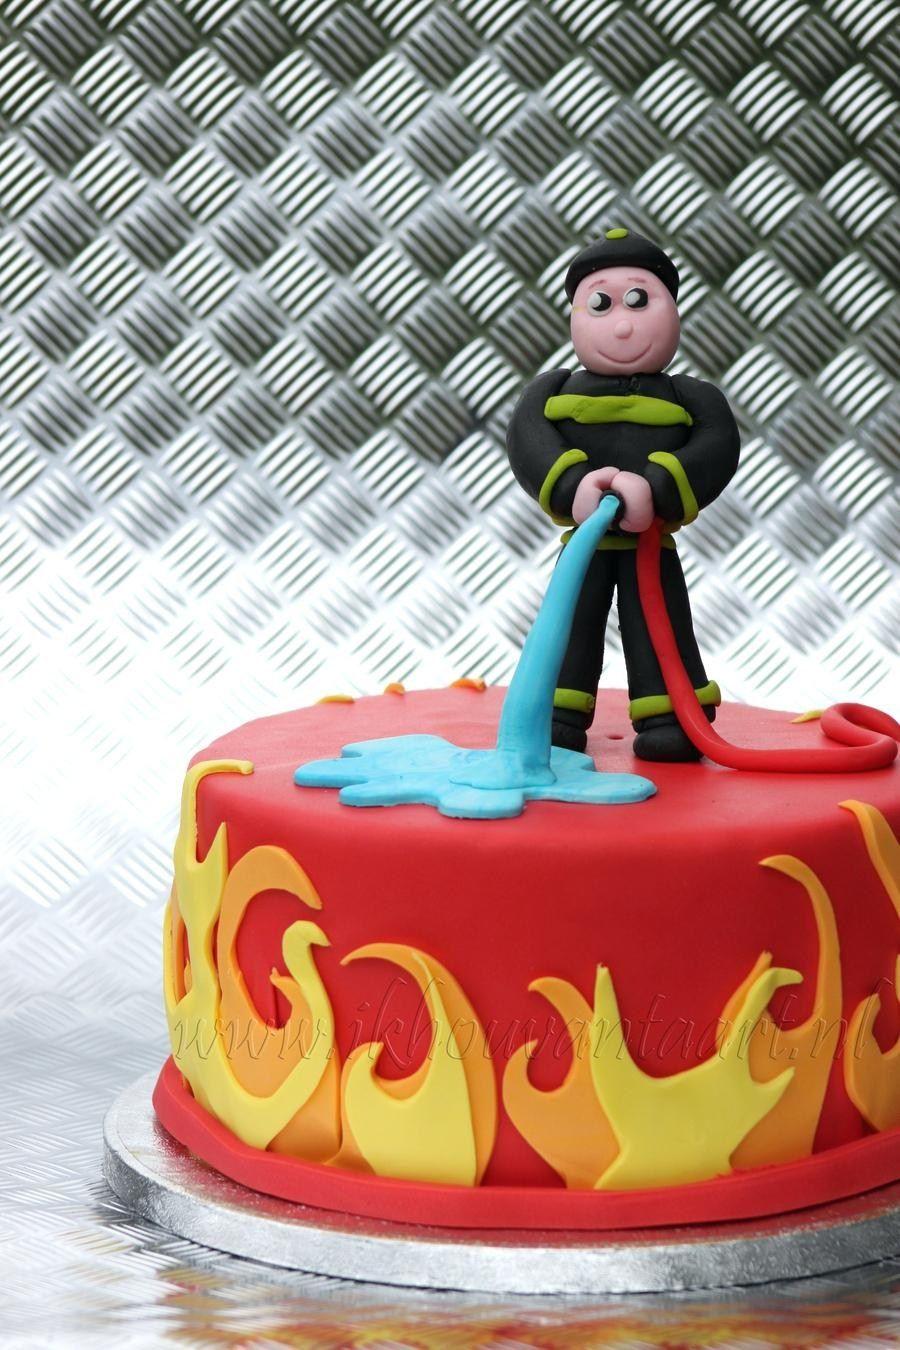 Amazing 21 Wonderful Image Of Fireman Birthday Cake Brandweerman Taart Funny Birthday Cards Online Overcheapnameinfo